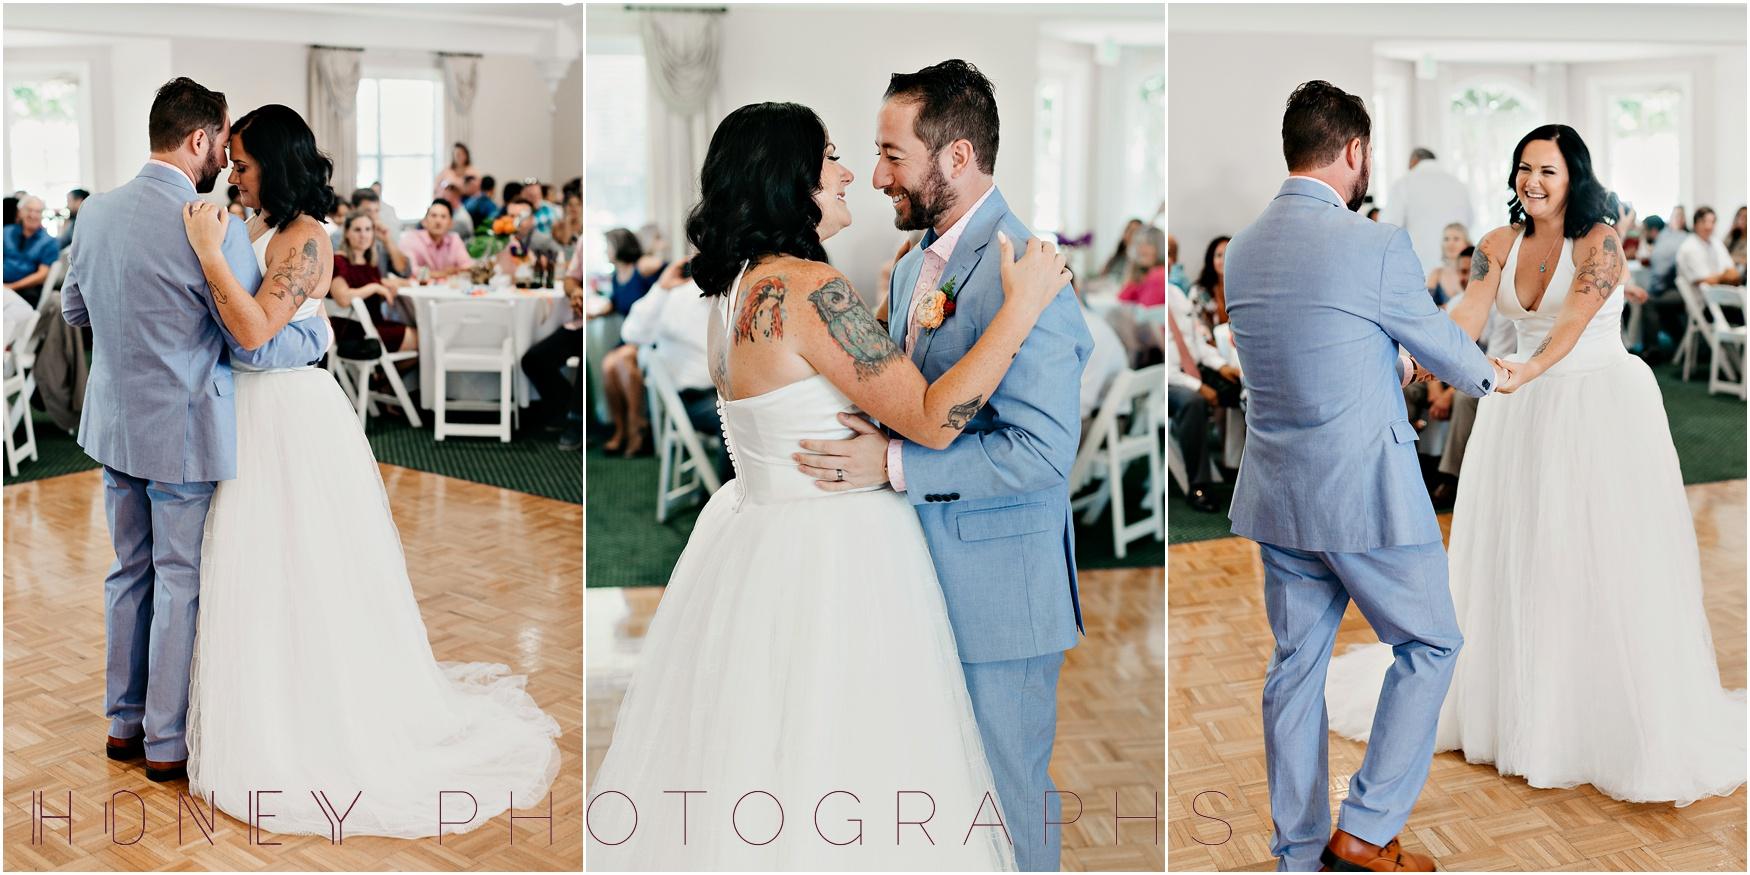 colorful_ecclectic_vibrant_vista_rainbow_quirky_wedding049.jpg